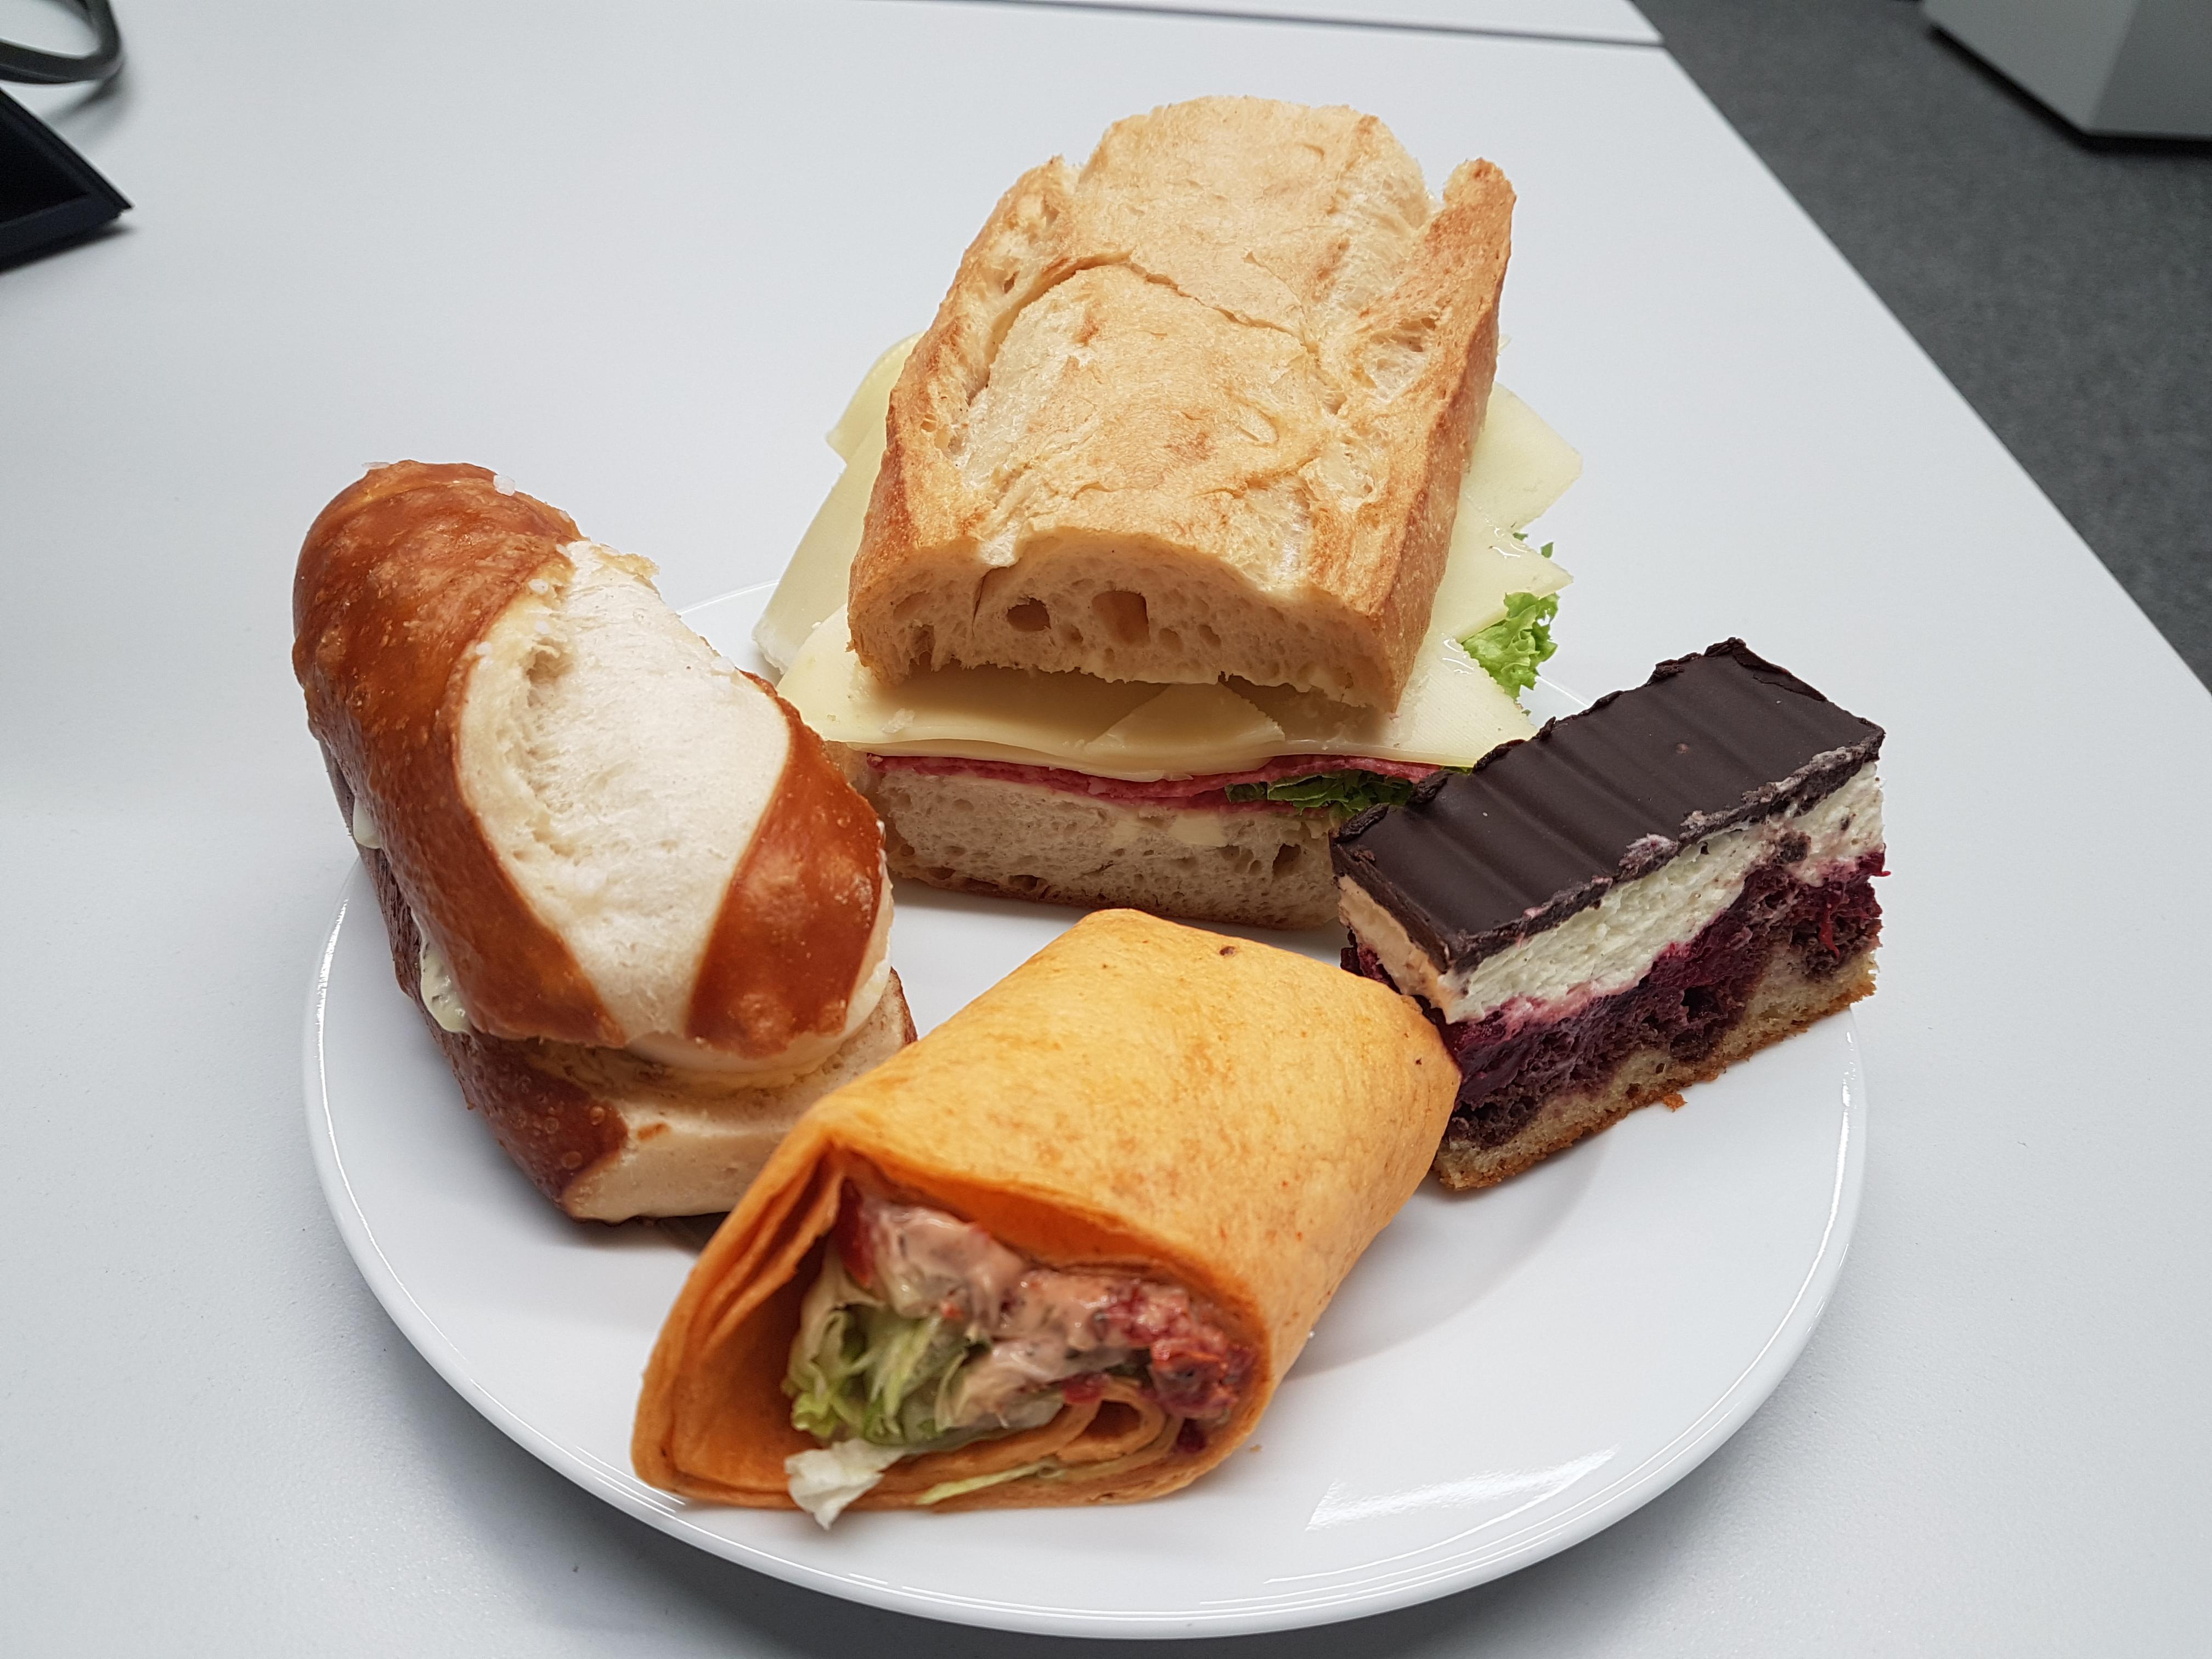 https://foodloader.net/Holz_2018-12-11_Snacks.jpg